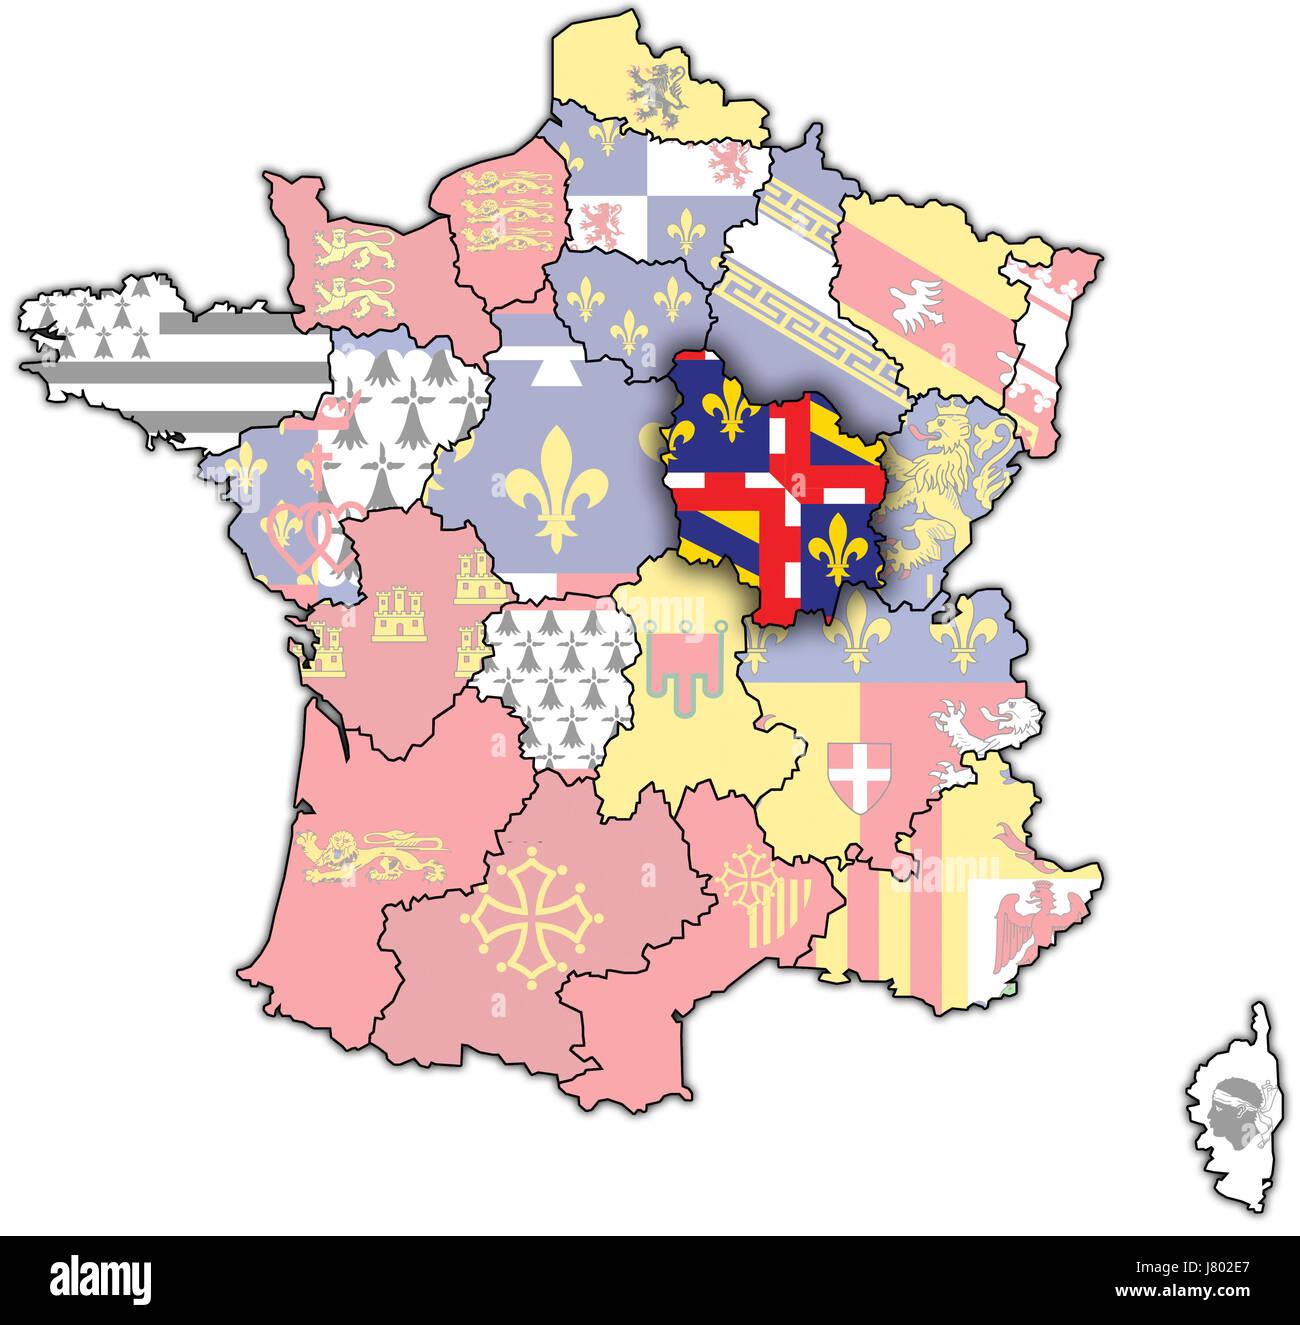 france flag region map atlas map of the world political colour